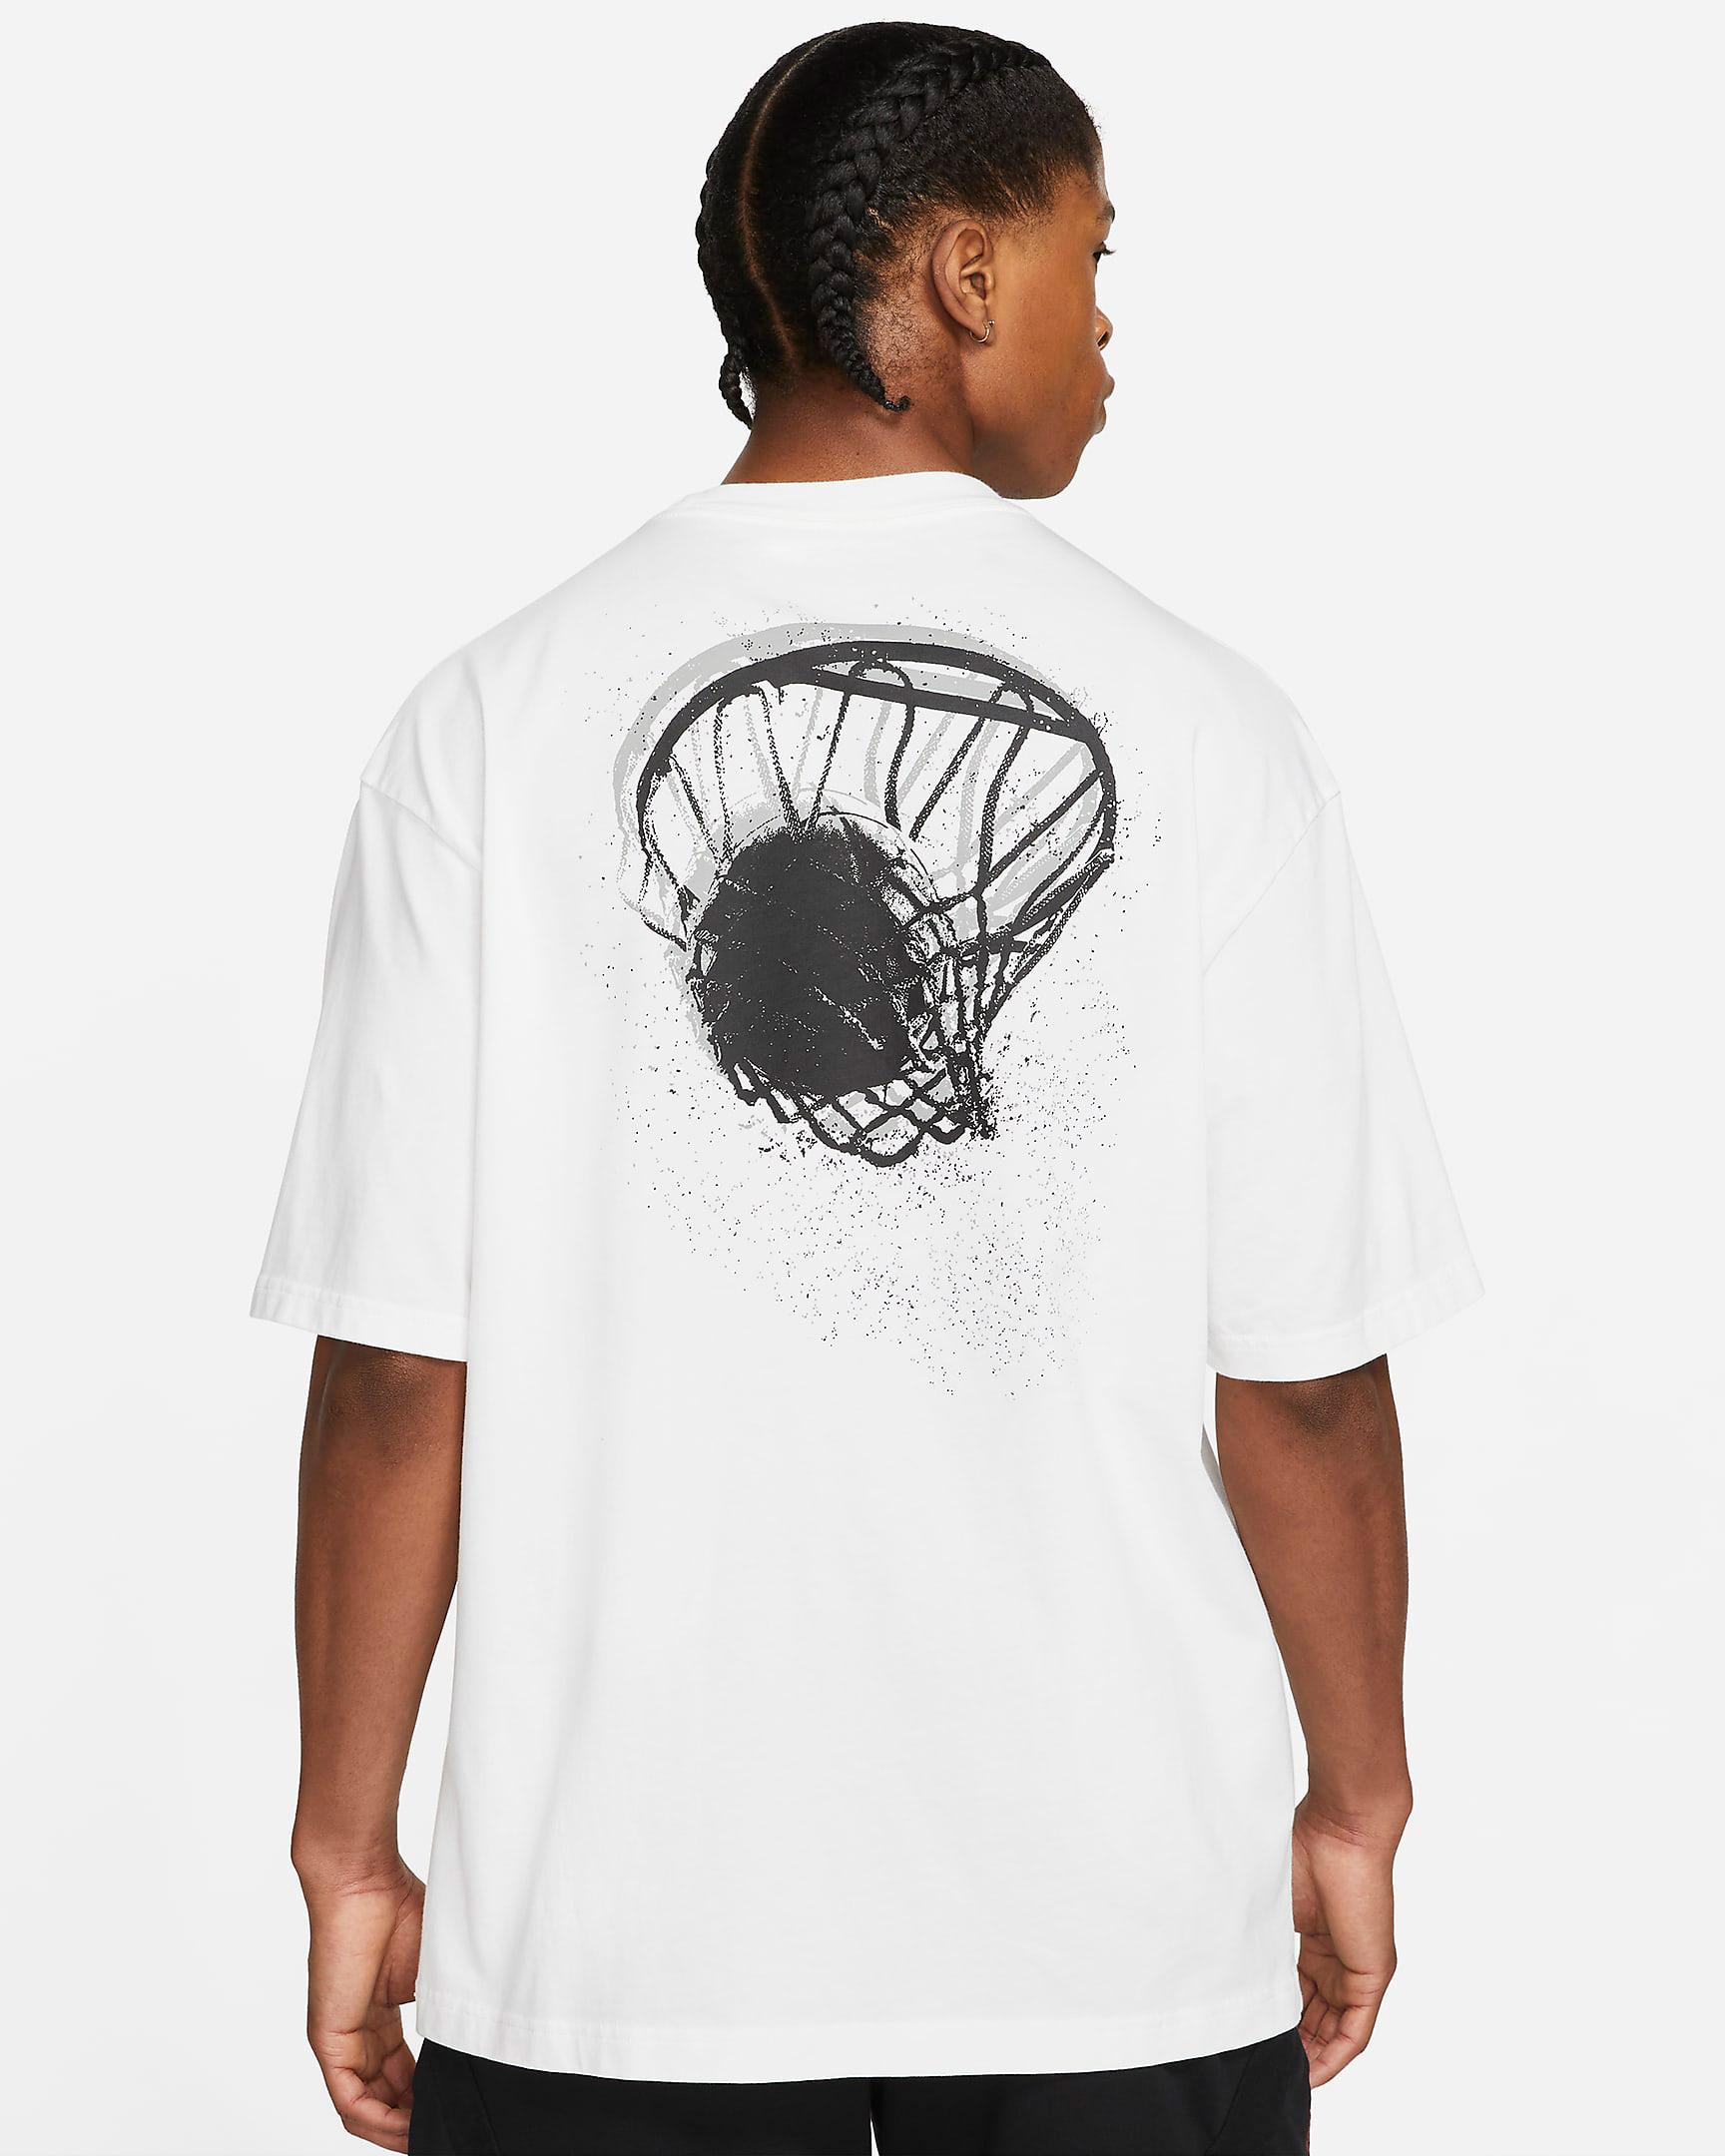 jordan-4-white-oreo-tee-shirt-1